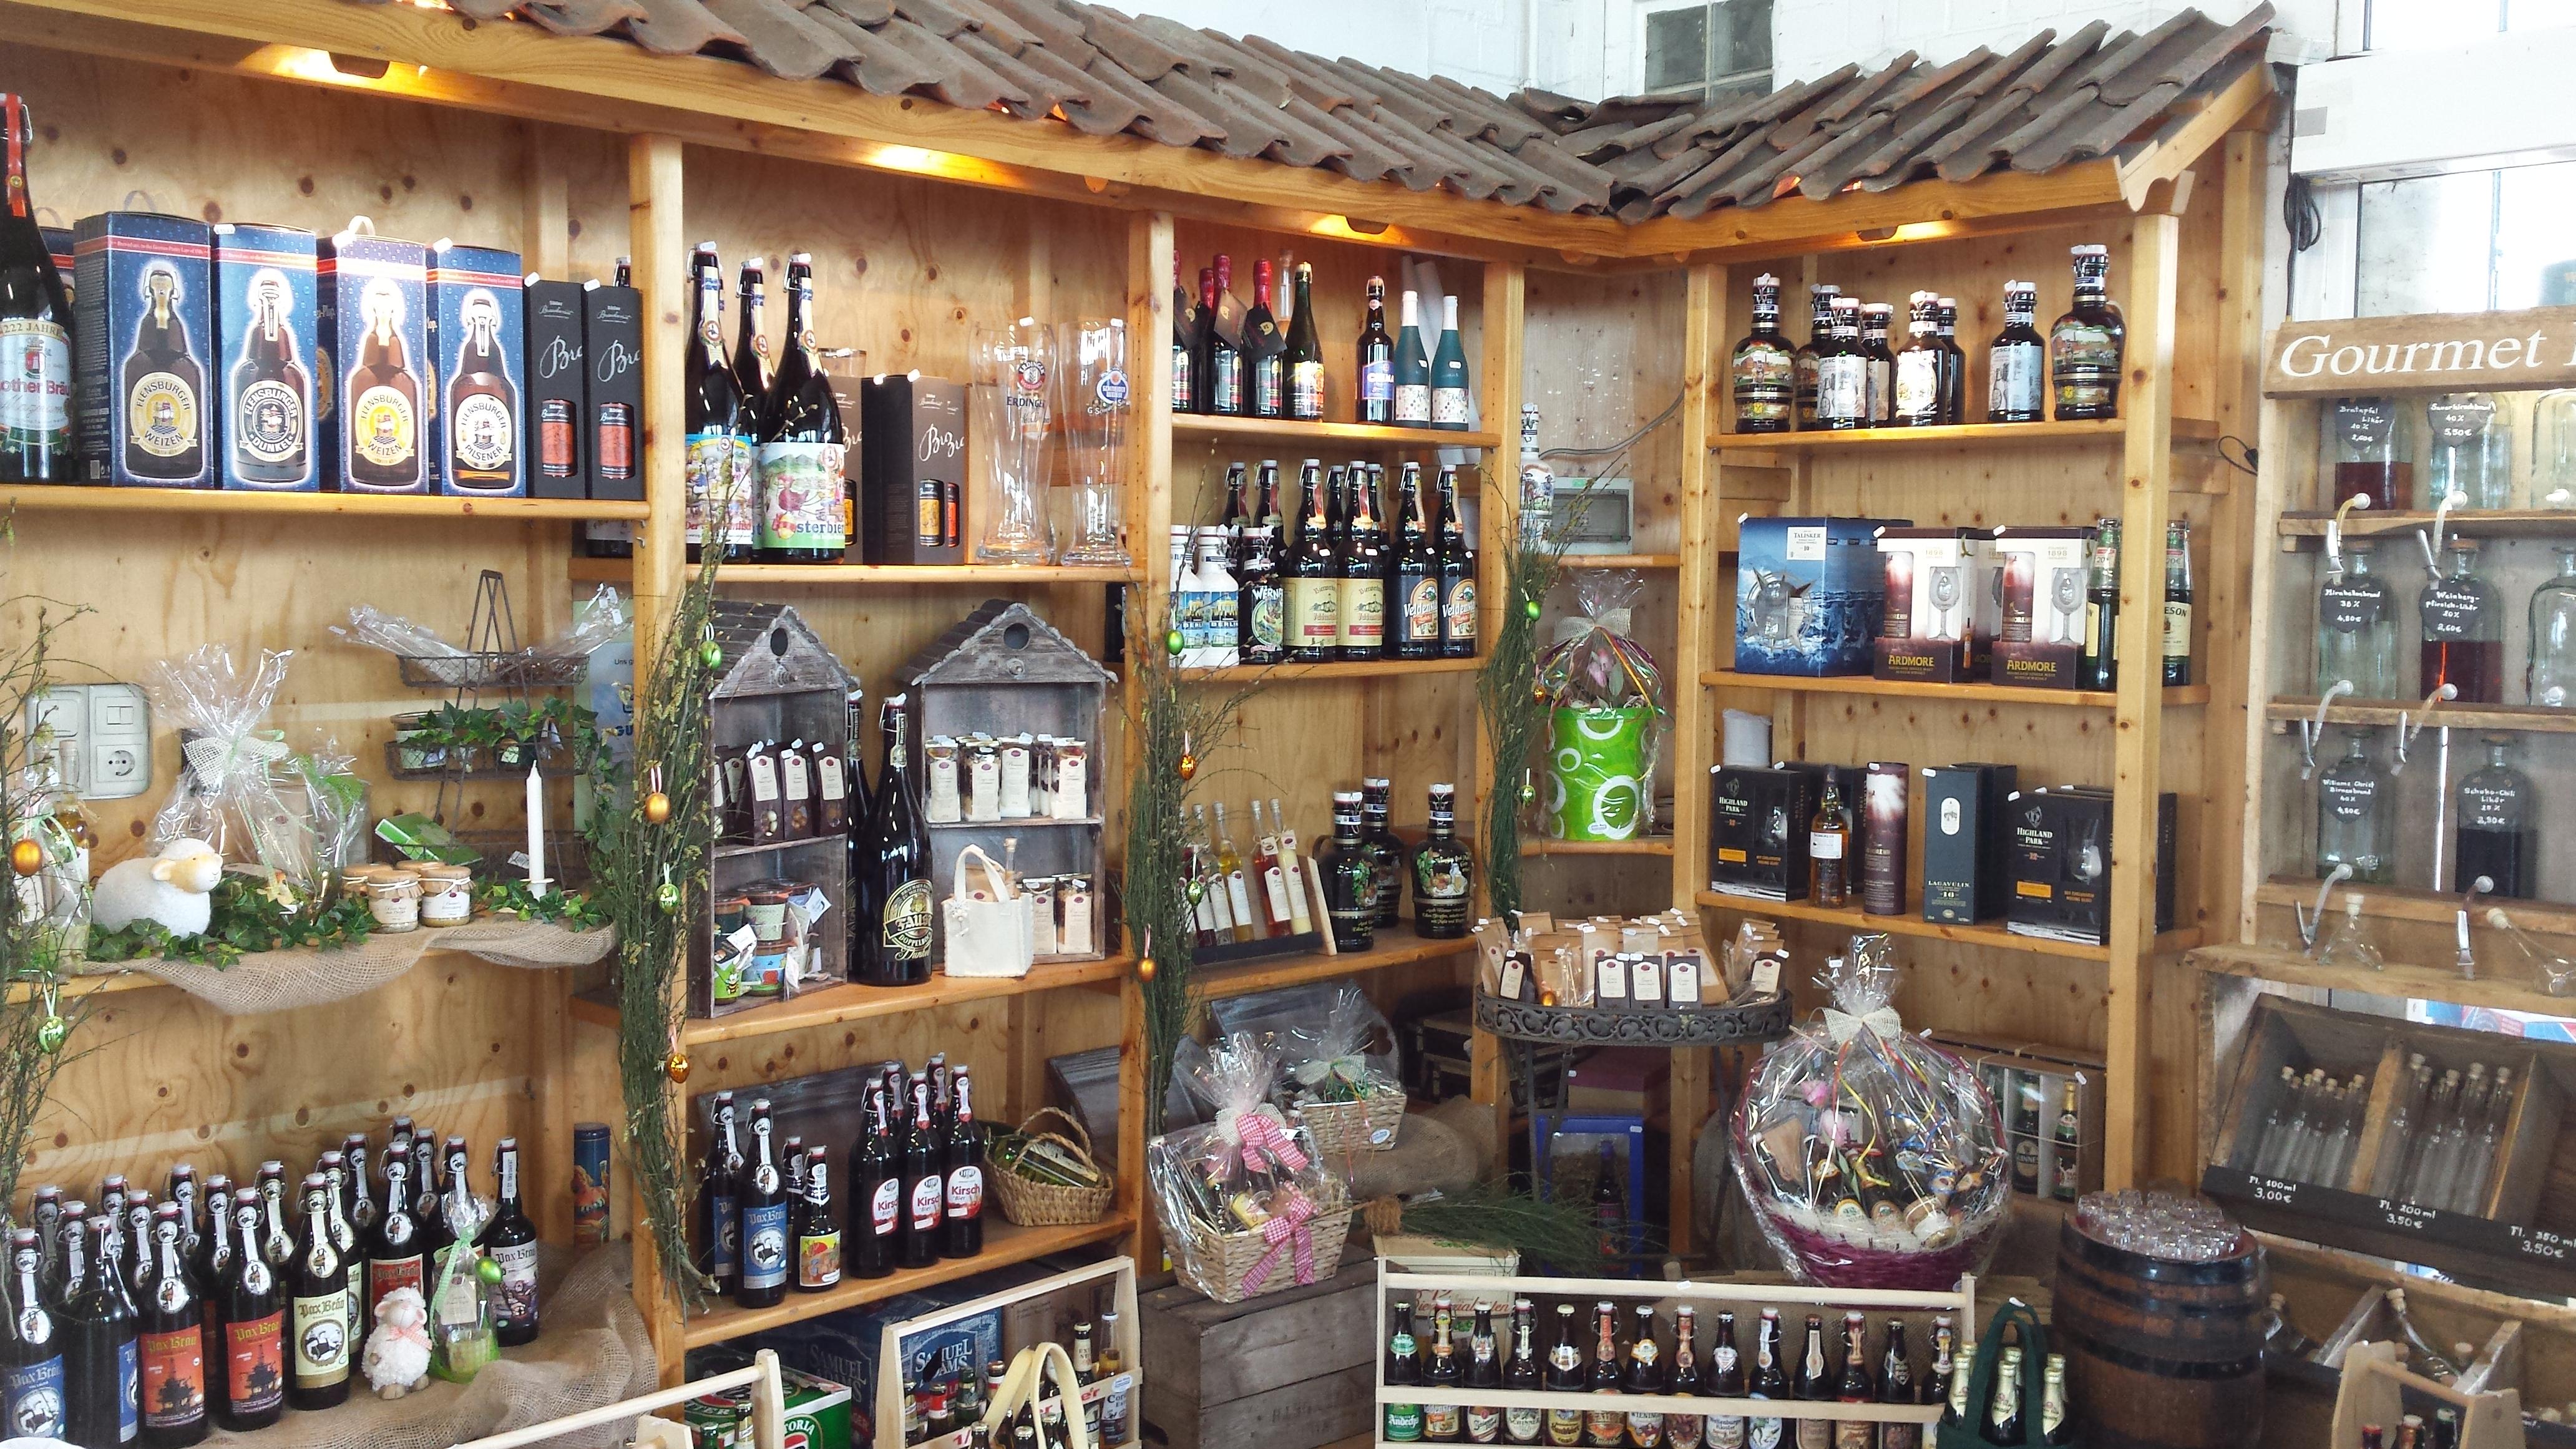 Geschenkestadl peter koch getr nkefachmarkt fulda for Koch 300 biersorten fulda